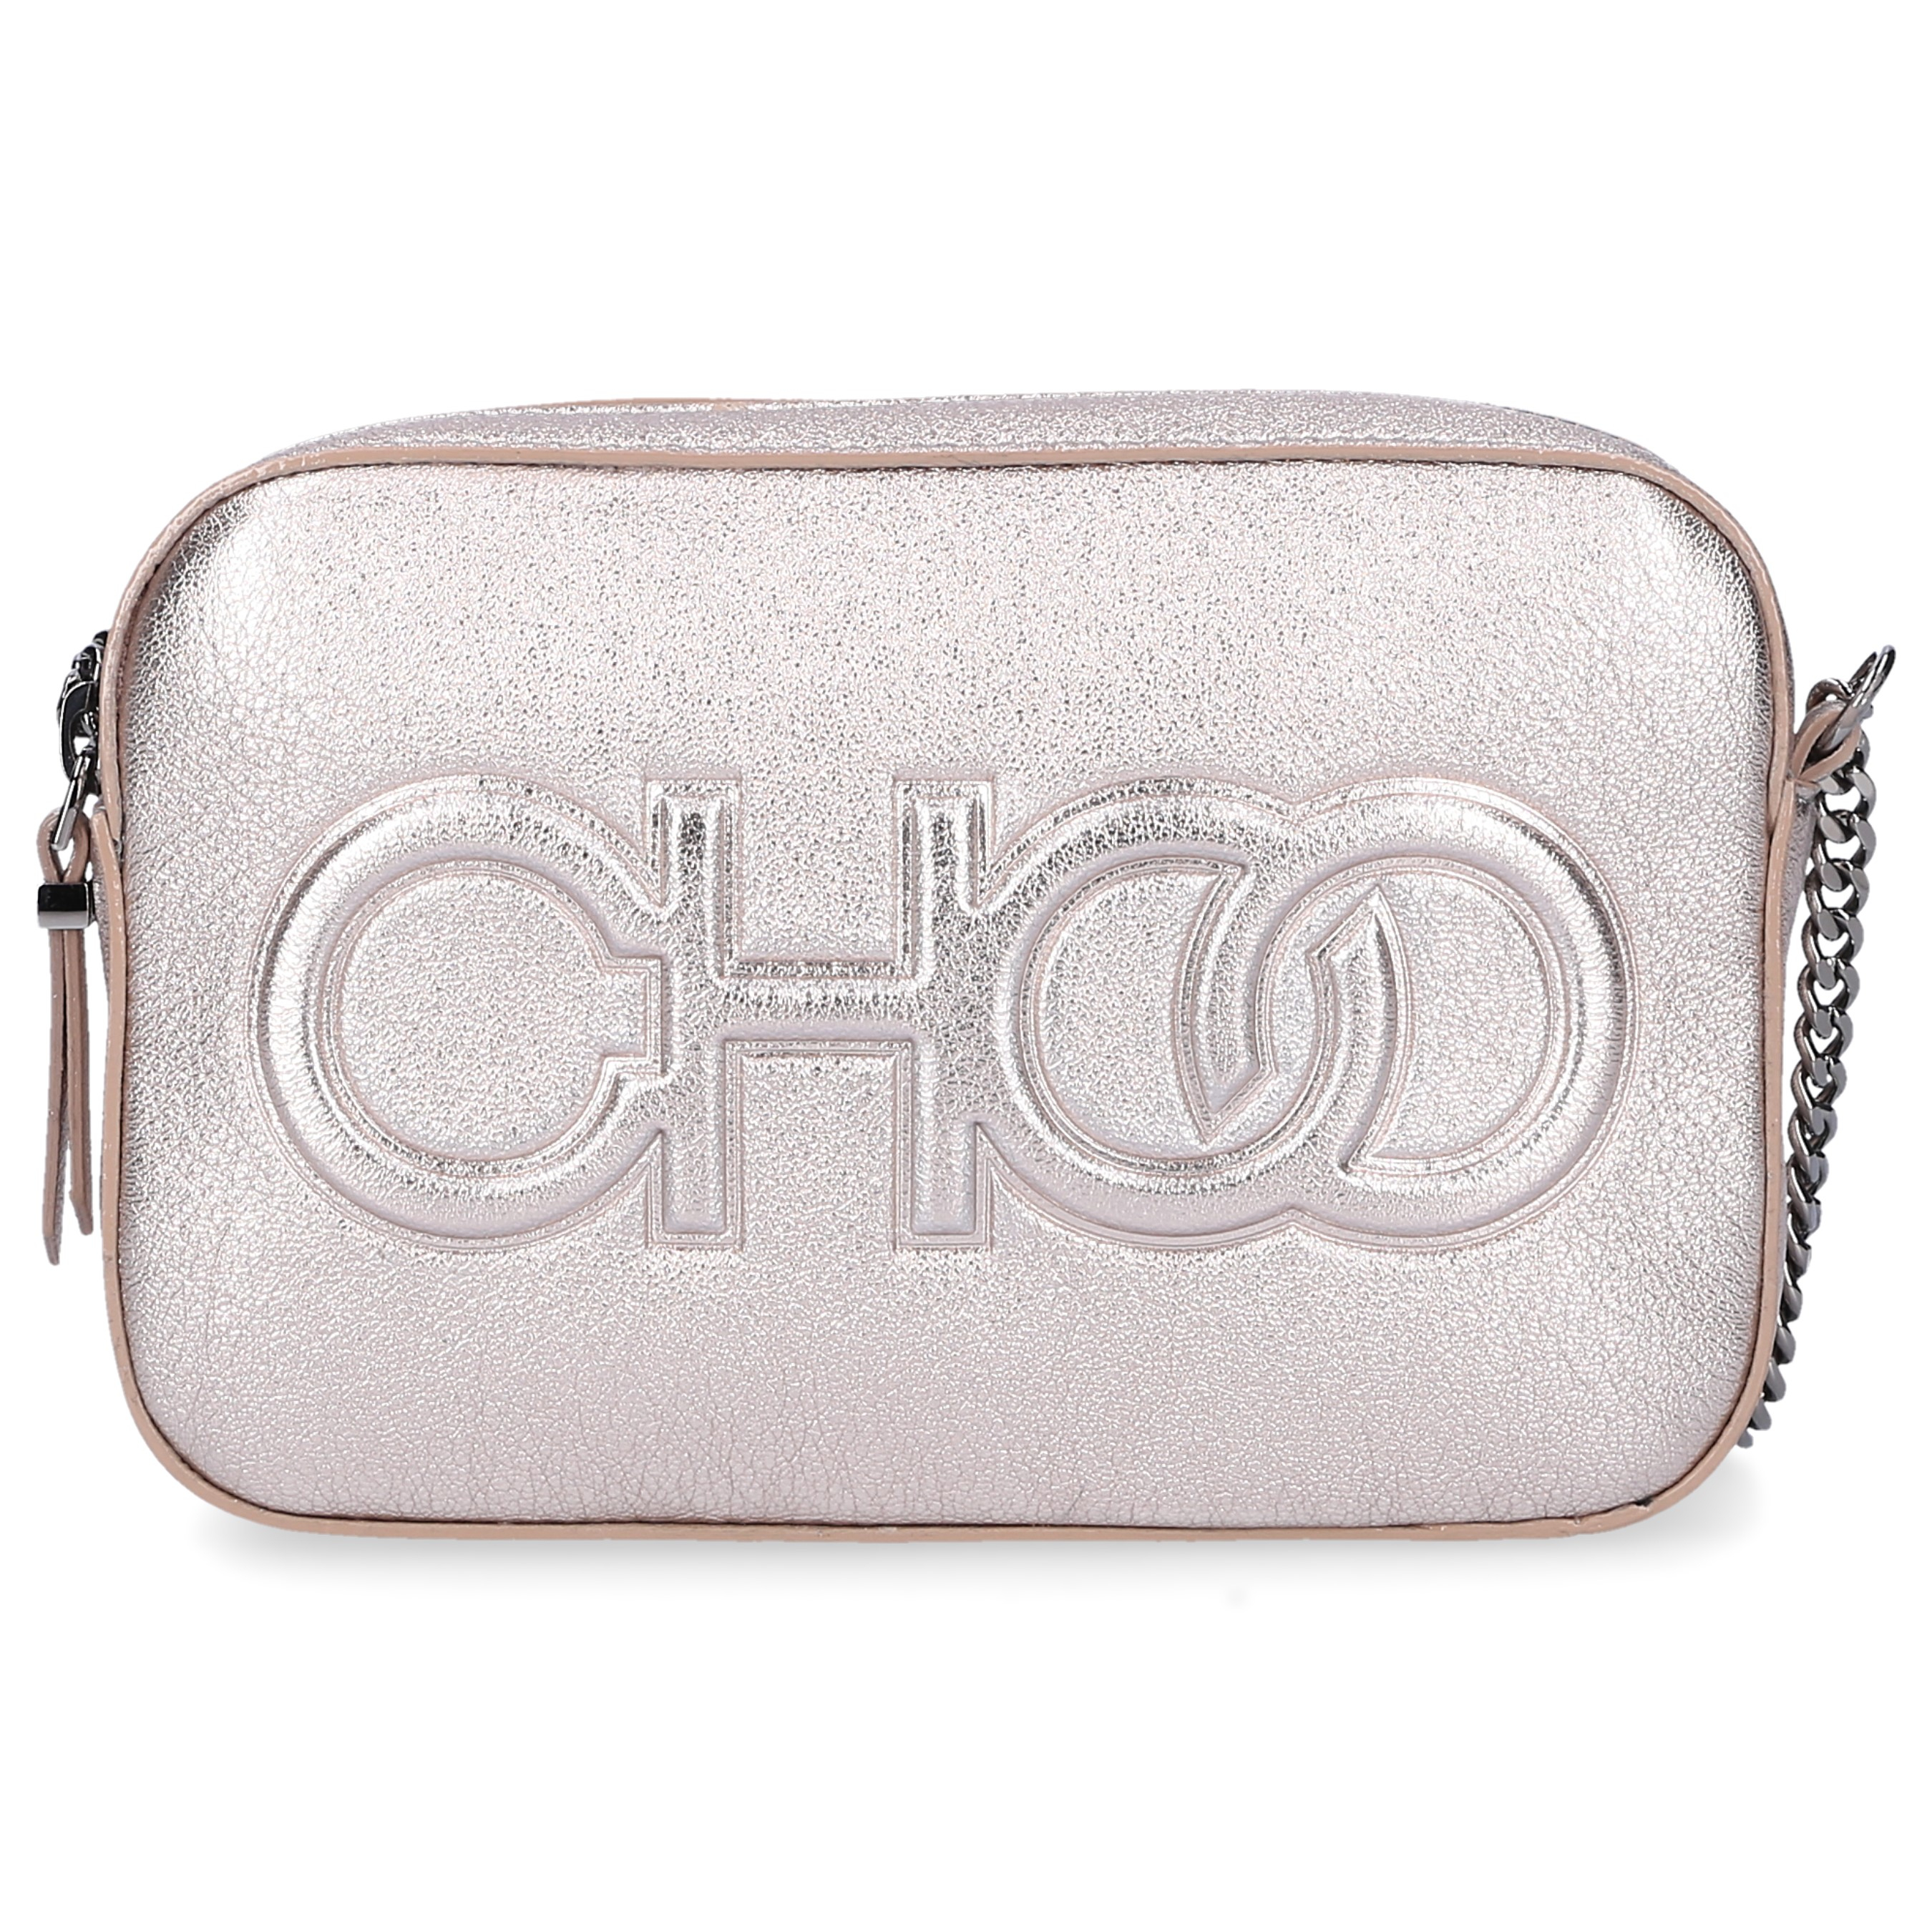 Jimmy Choo Handtasche BALTI Nappaleder Logo gold